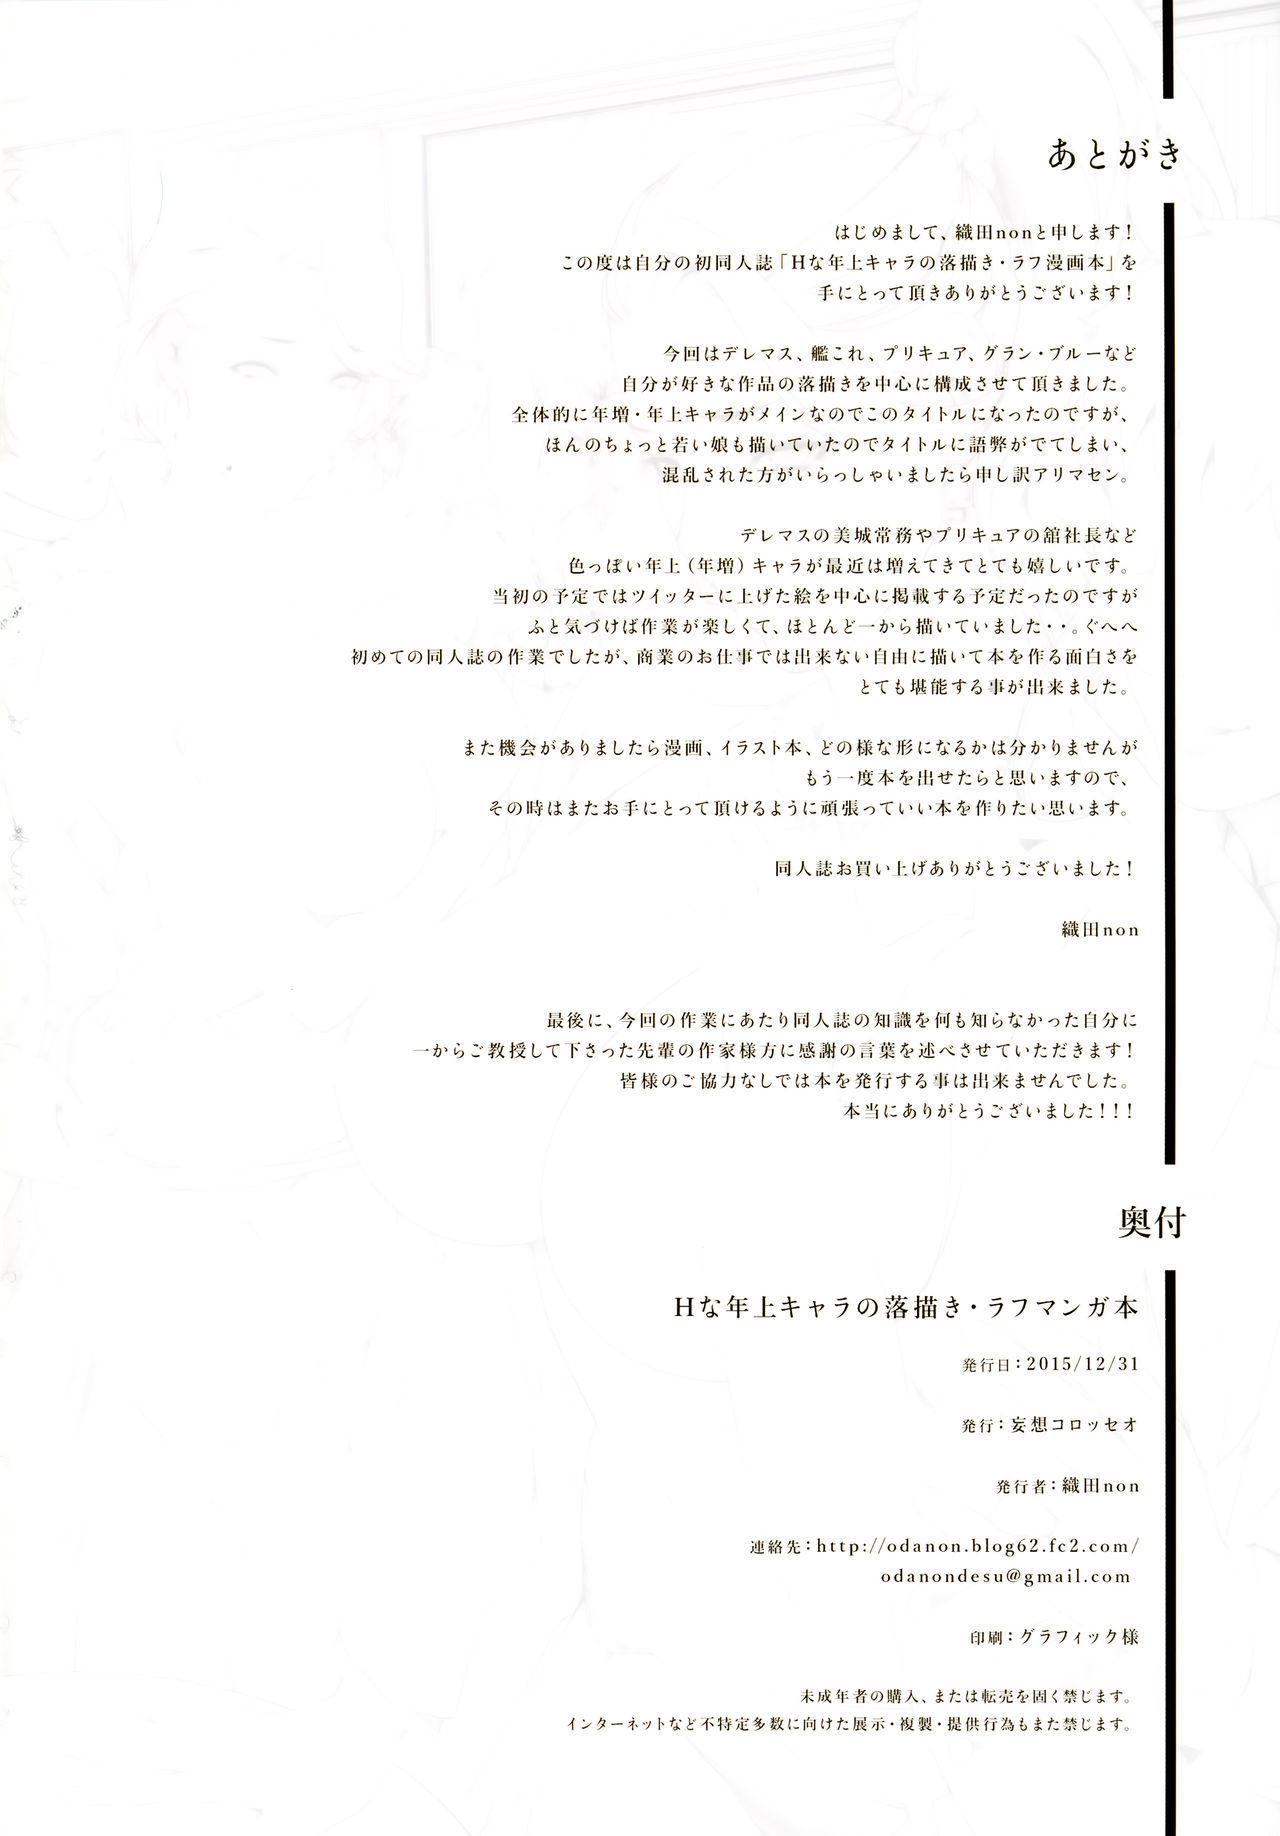 H na Toshiue Chara no Rakugaki - Rough Manga Hon | A Collection of Sketches and Rough Manga of Hot MILFs 28